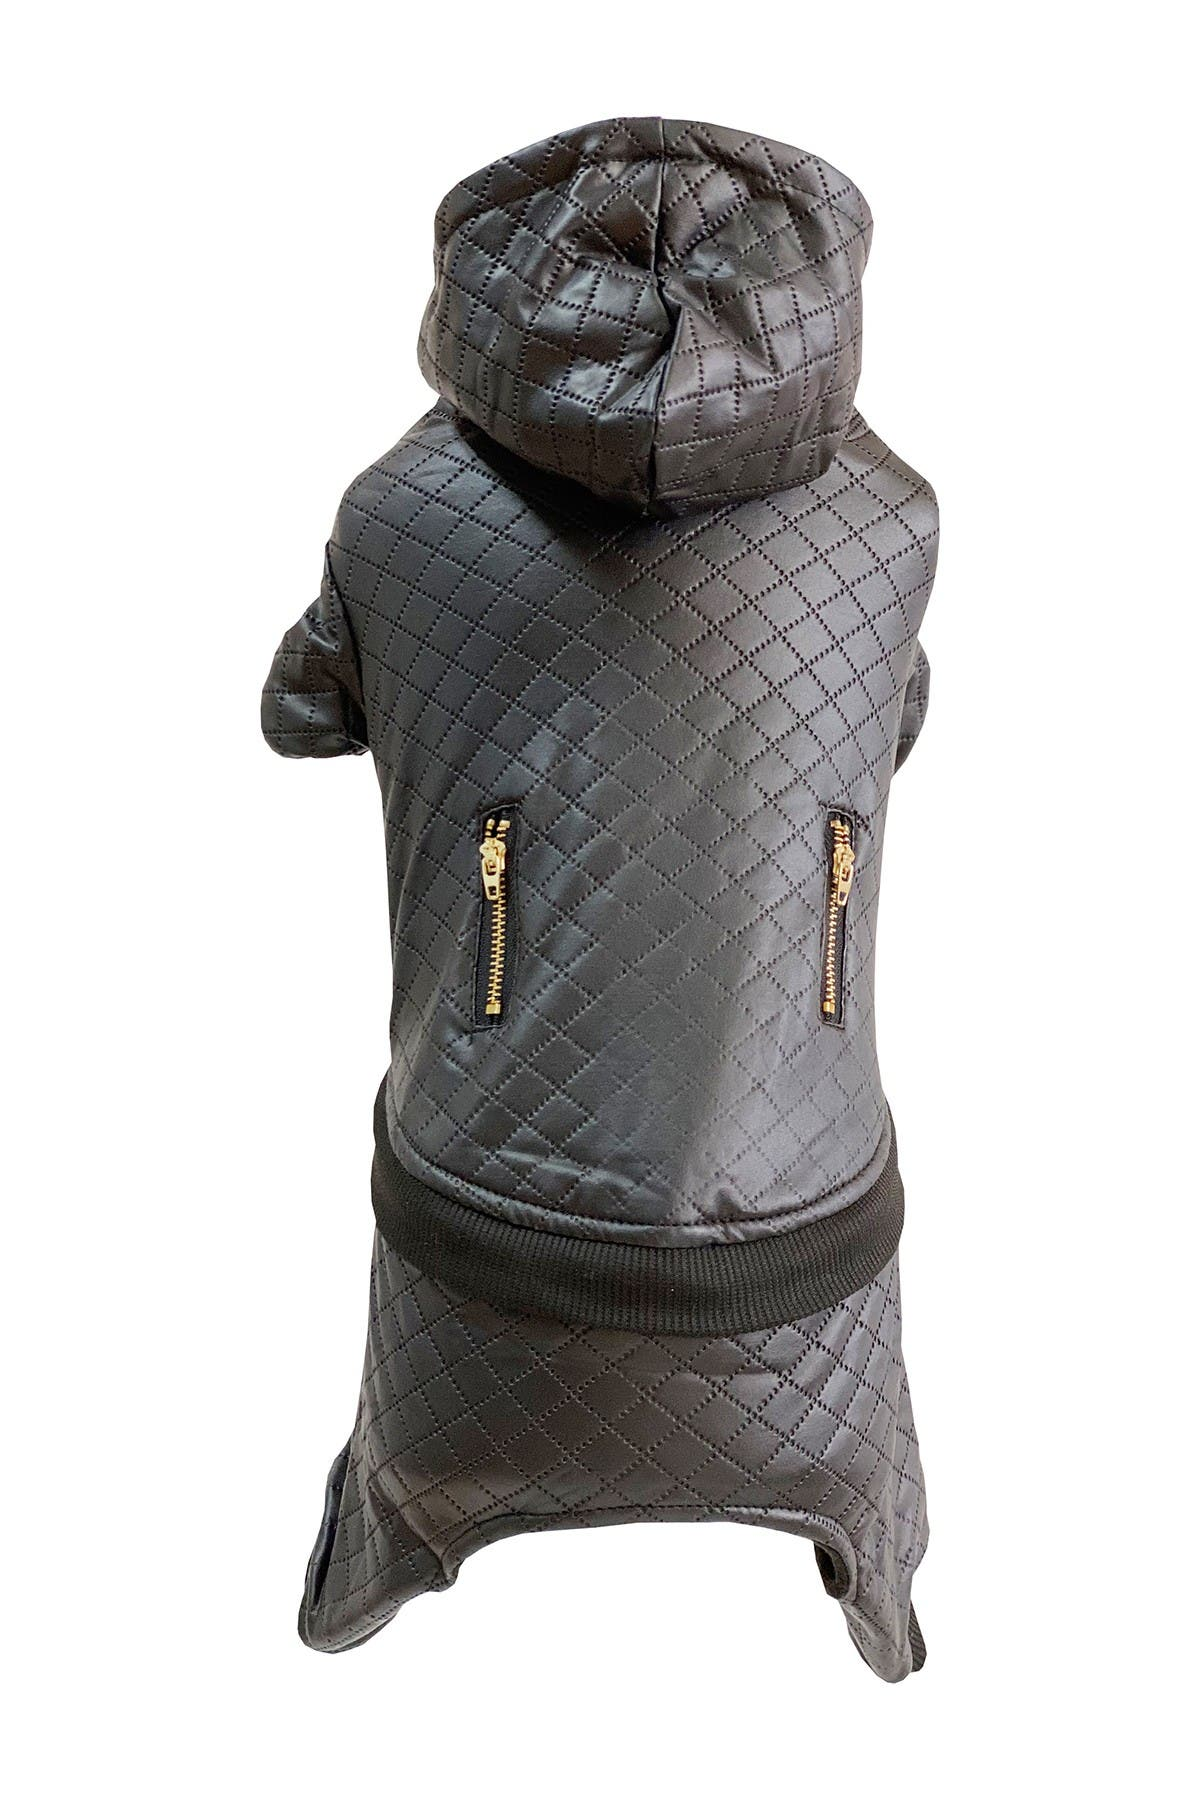 Image of Dogs of Glamour Medium Black Classic Bark Jumpsuit